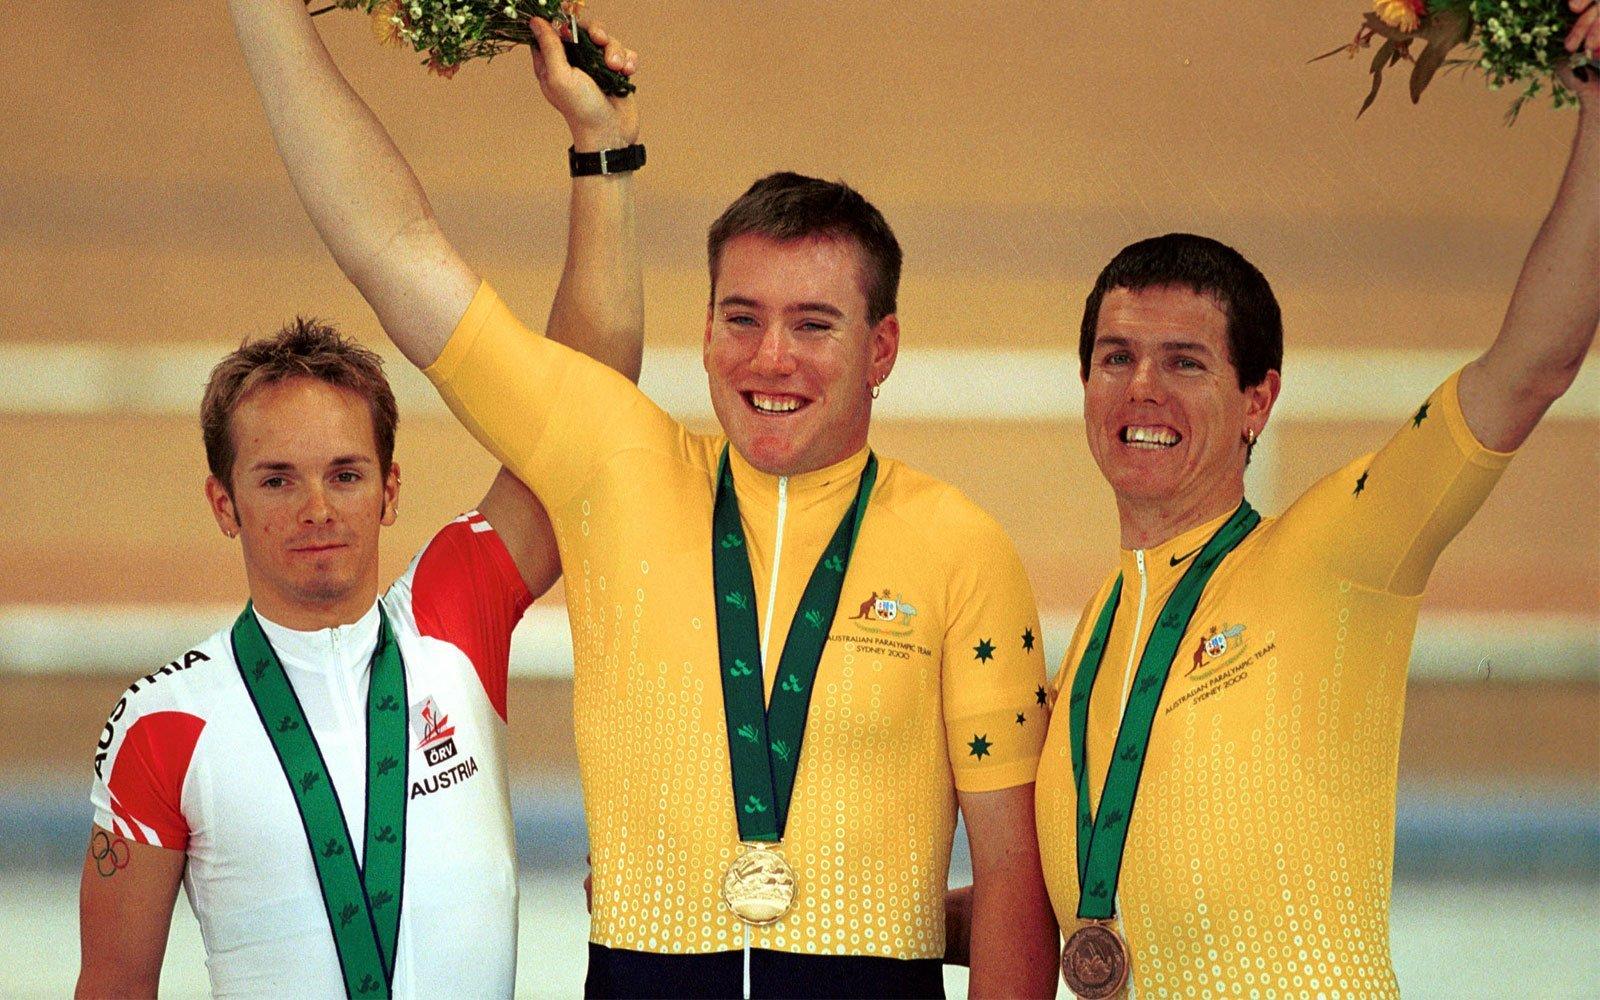 Sydney 2000: Day 1, 19 October